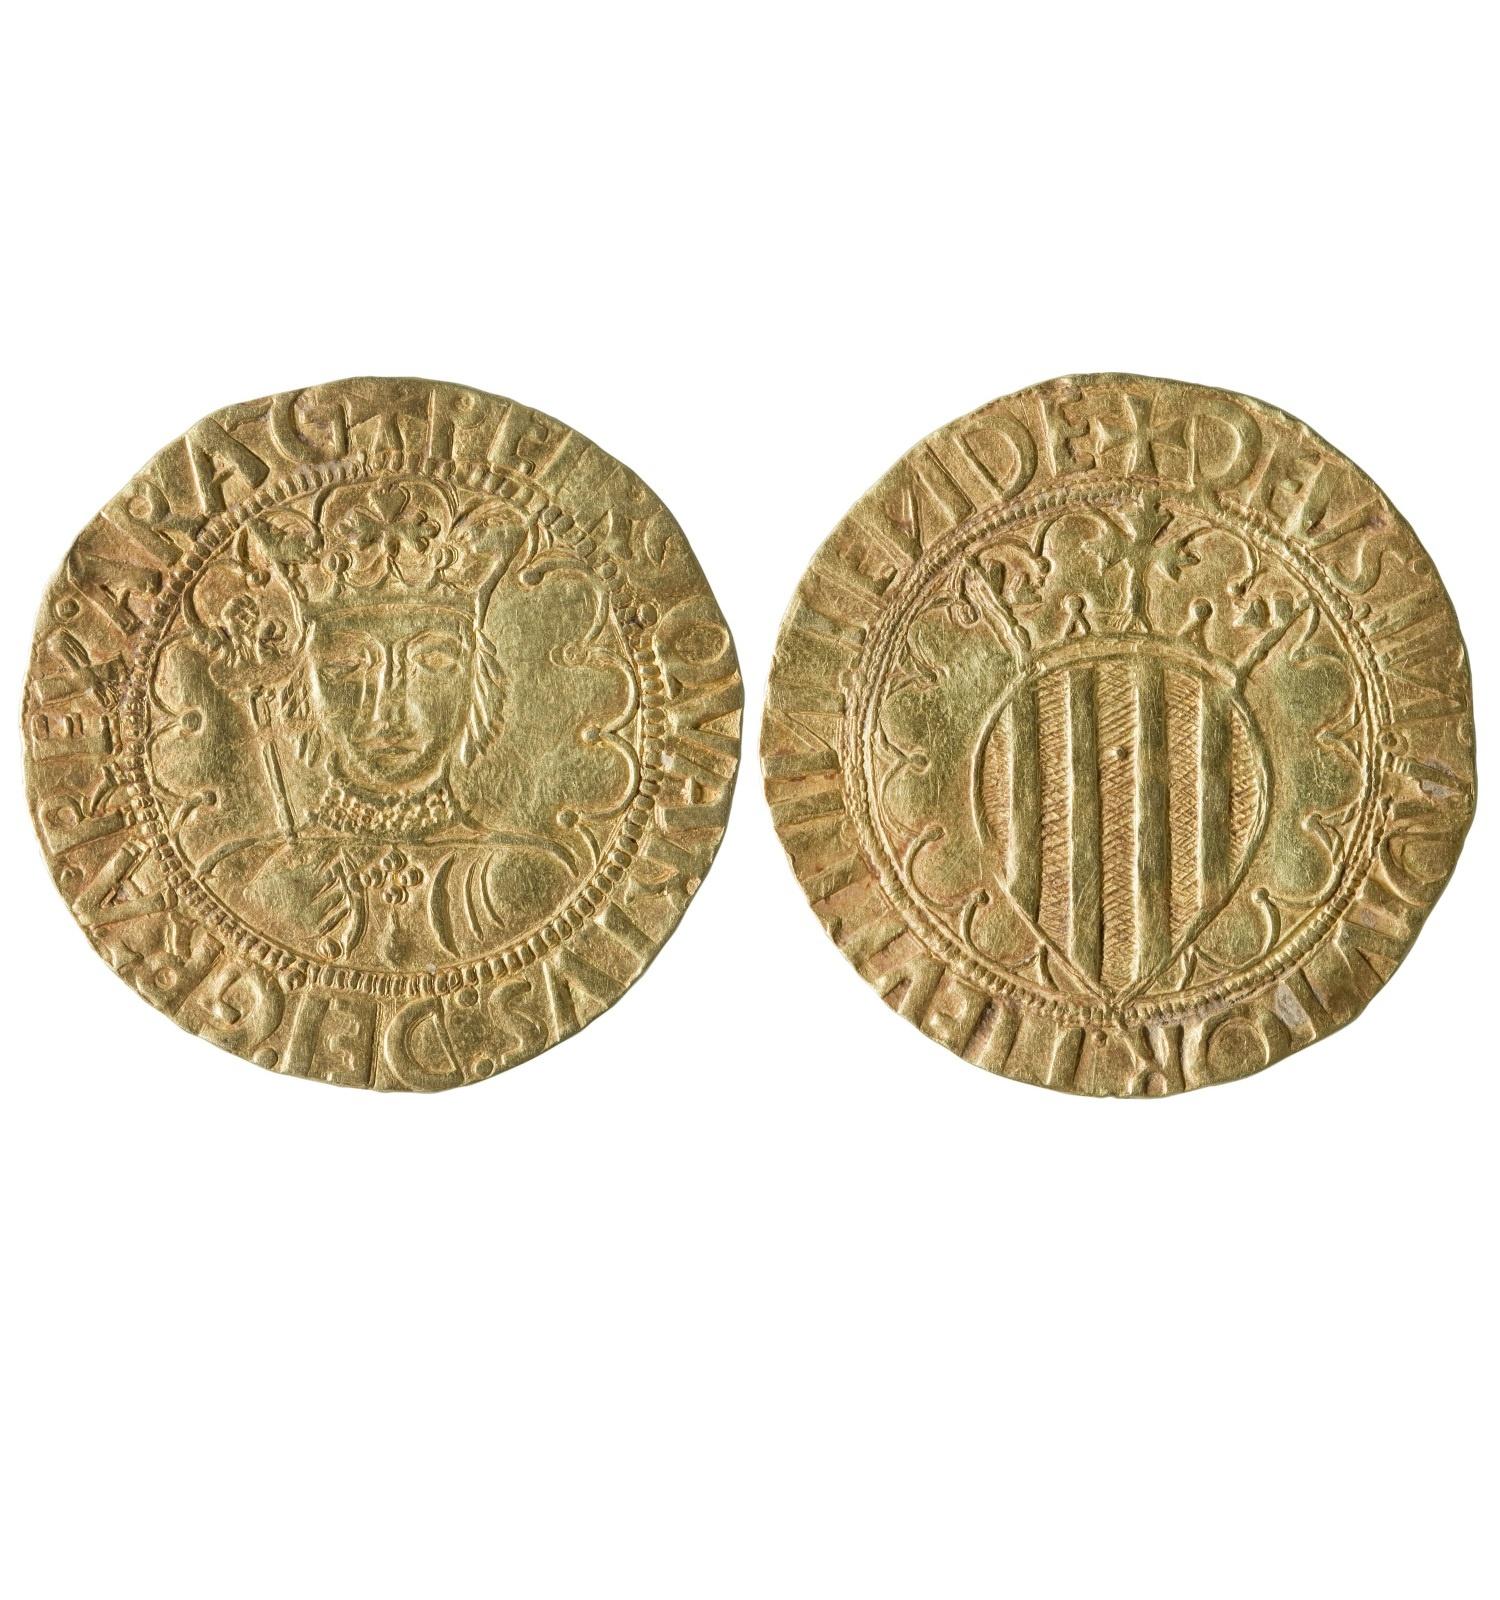 Pere IV, Conestable de Portugal, pacífic de Barcelona, 1465-1466 MNAC/GNC 312787-N